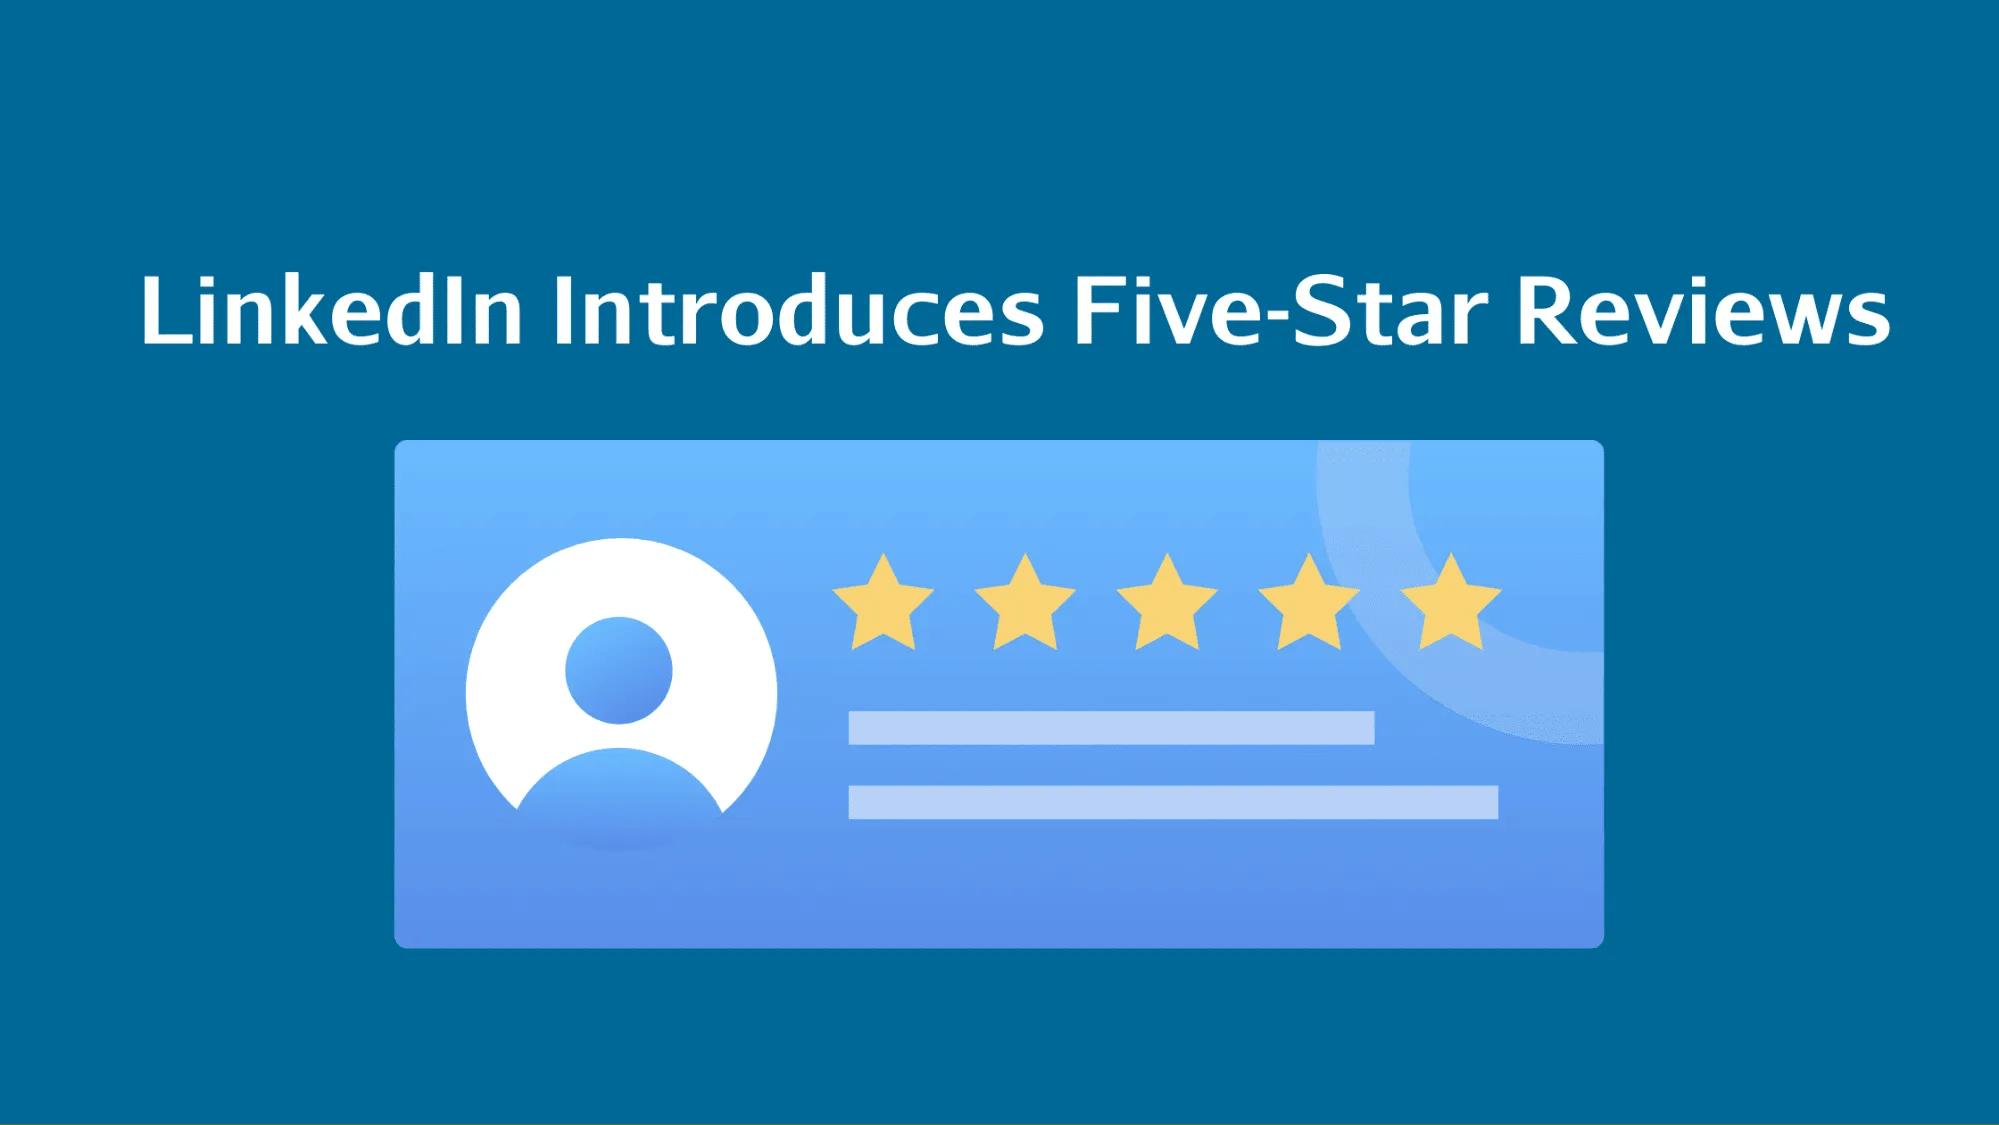 LinkedIn Introduces Five Star Reviews